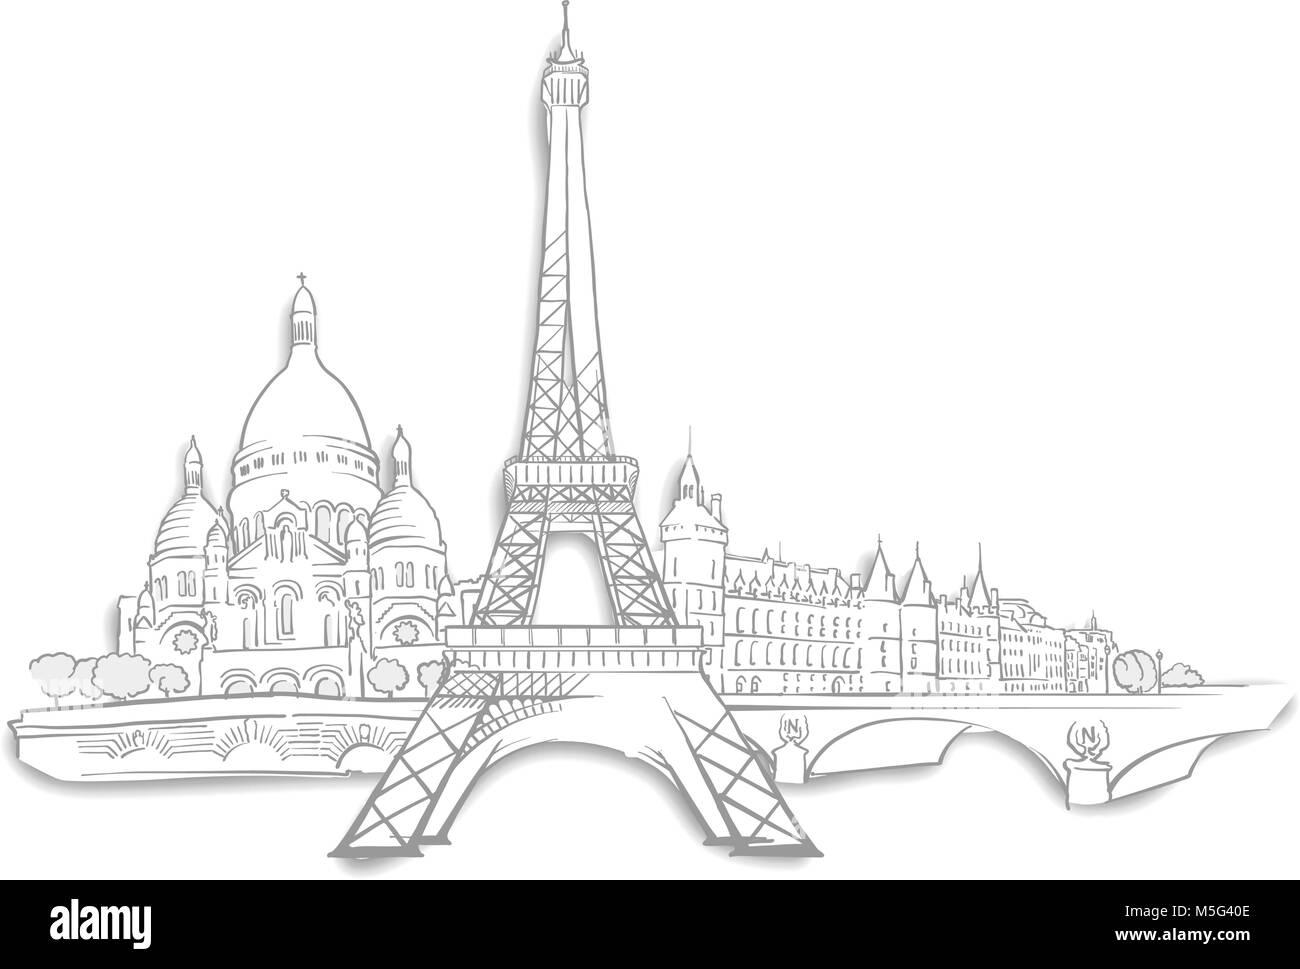 Line Art Hand : Paris landmarks sketches line art drawing by hand travel design